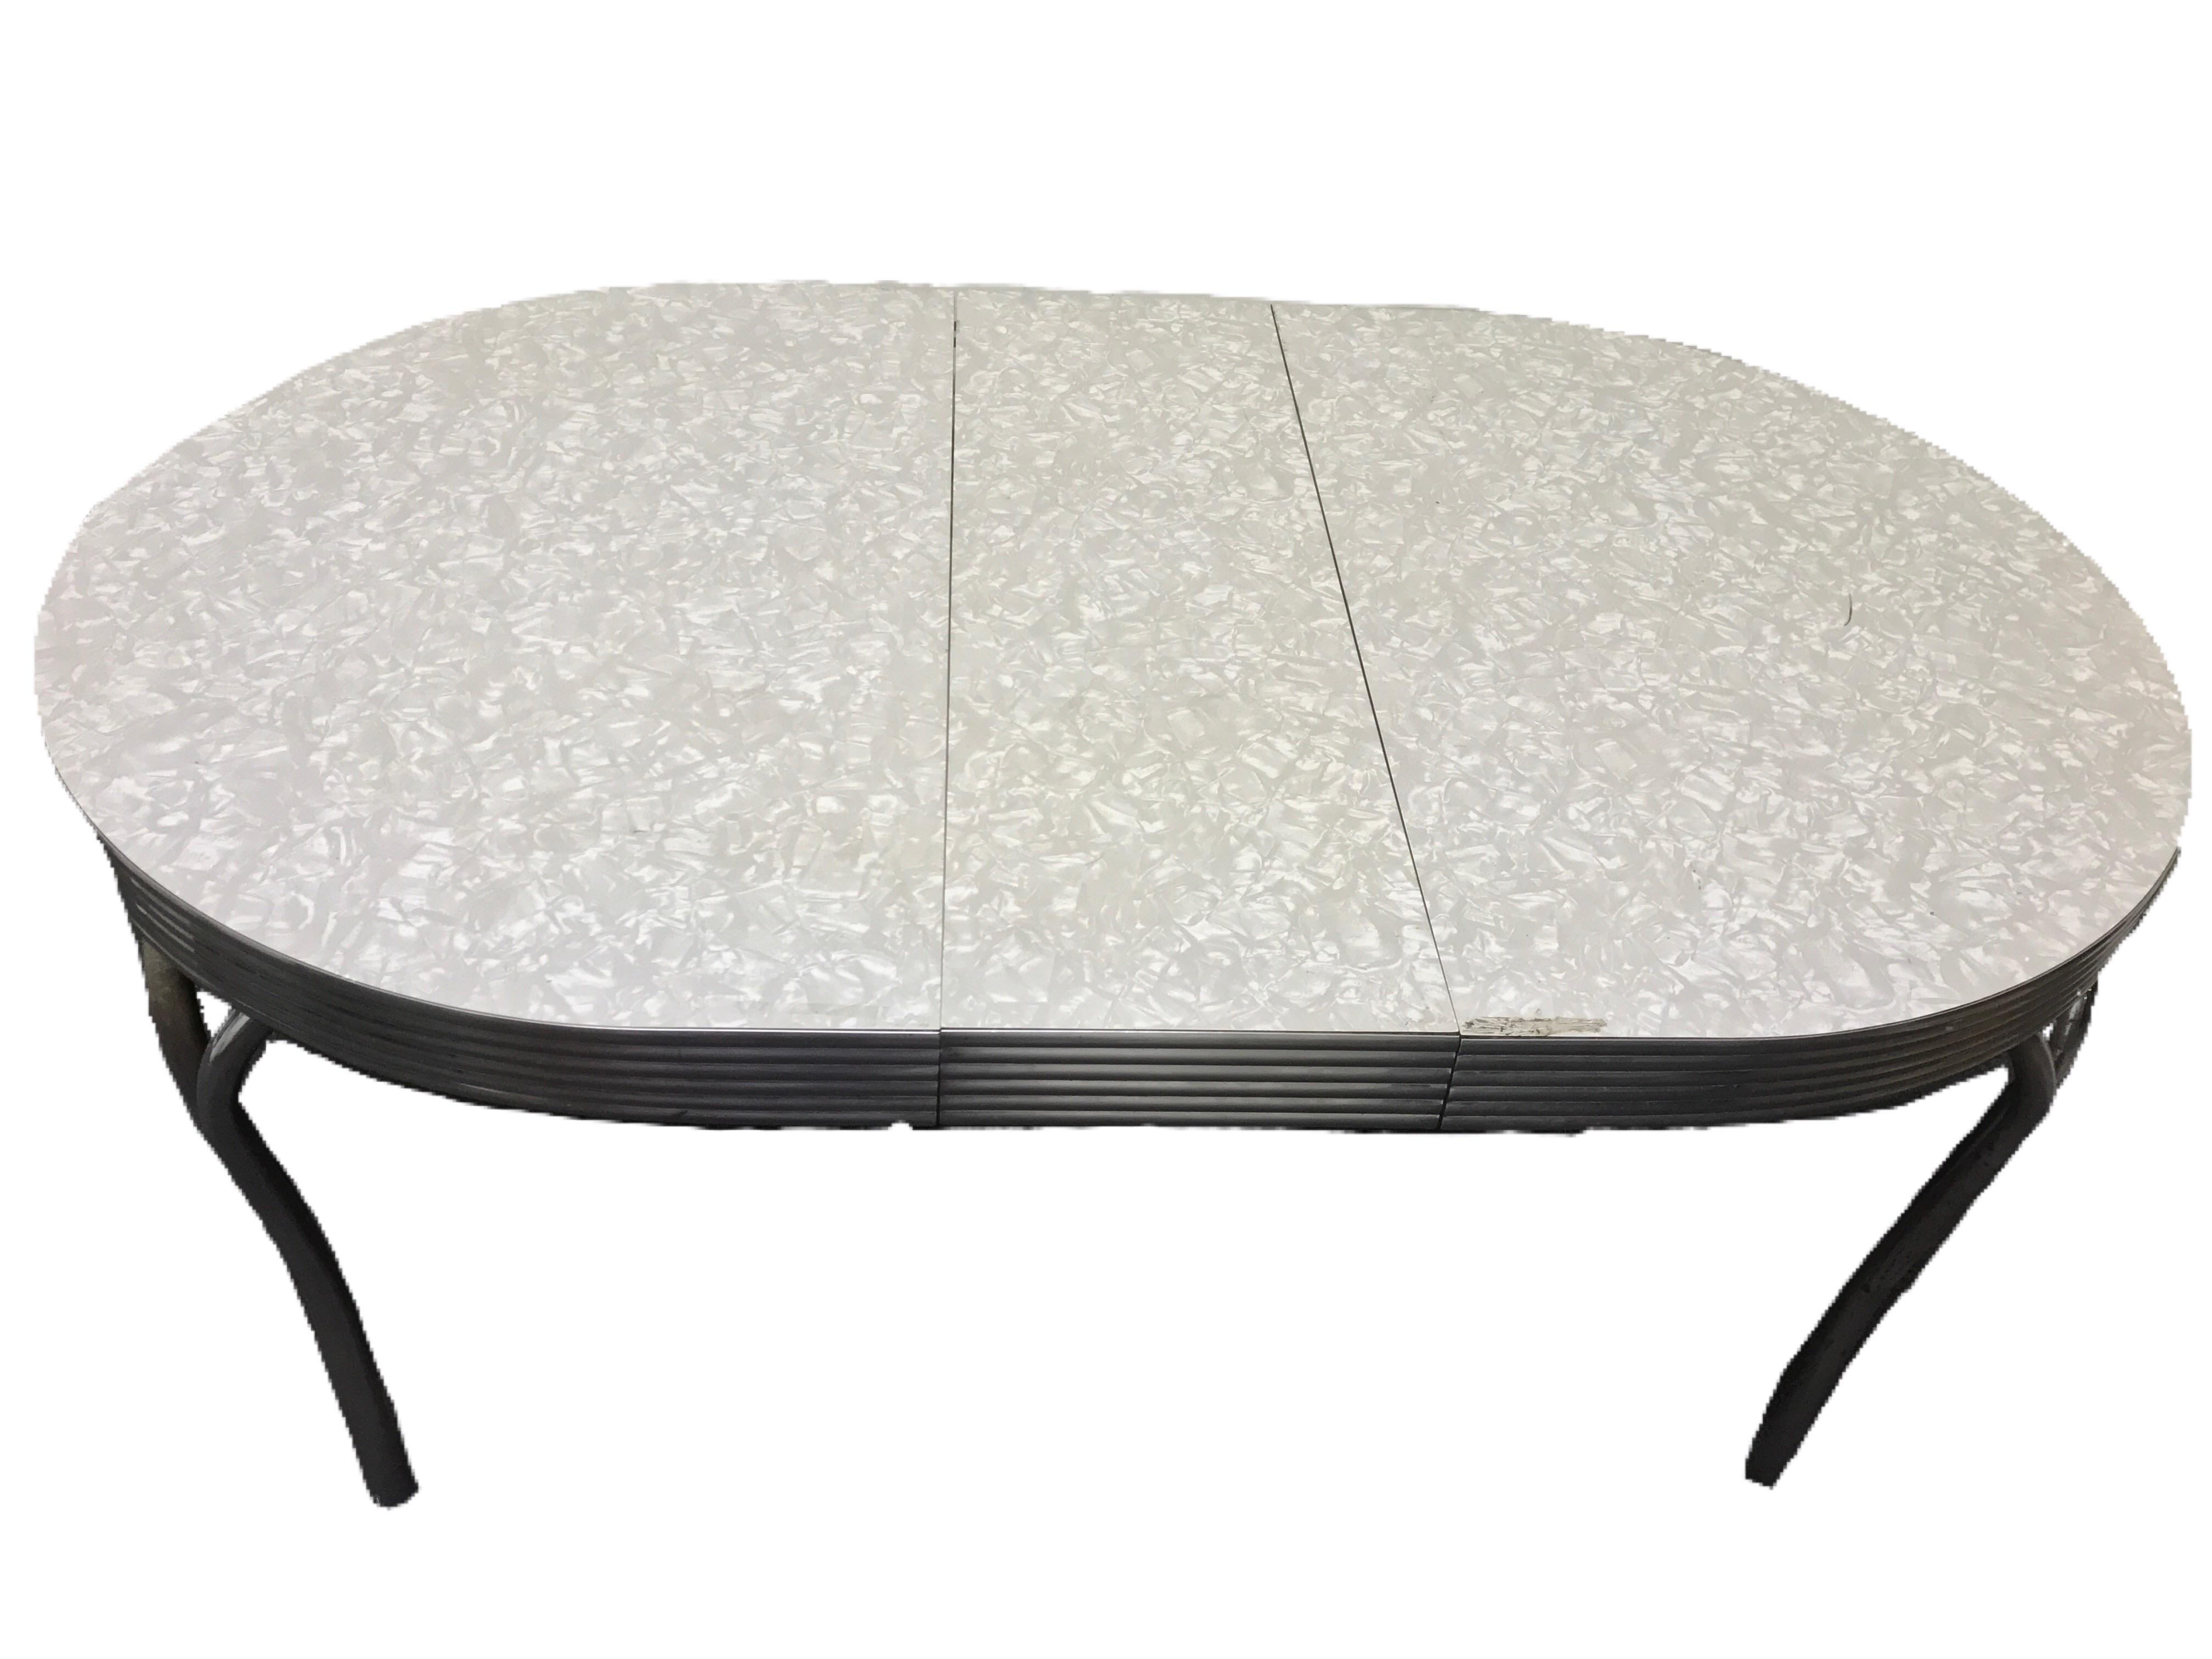 Vitro Vintage Cracked Ice Formica Amp Chrome Dinette Table